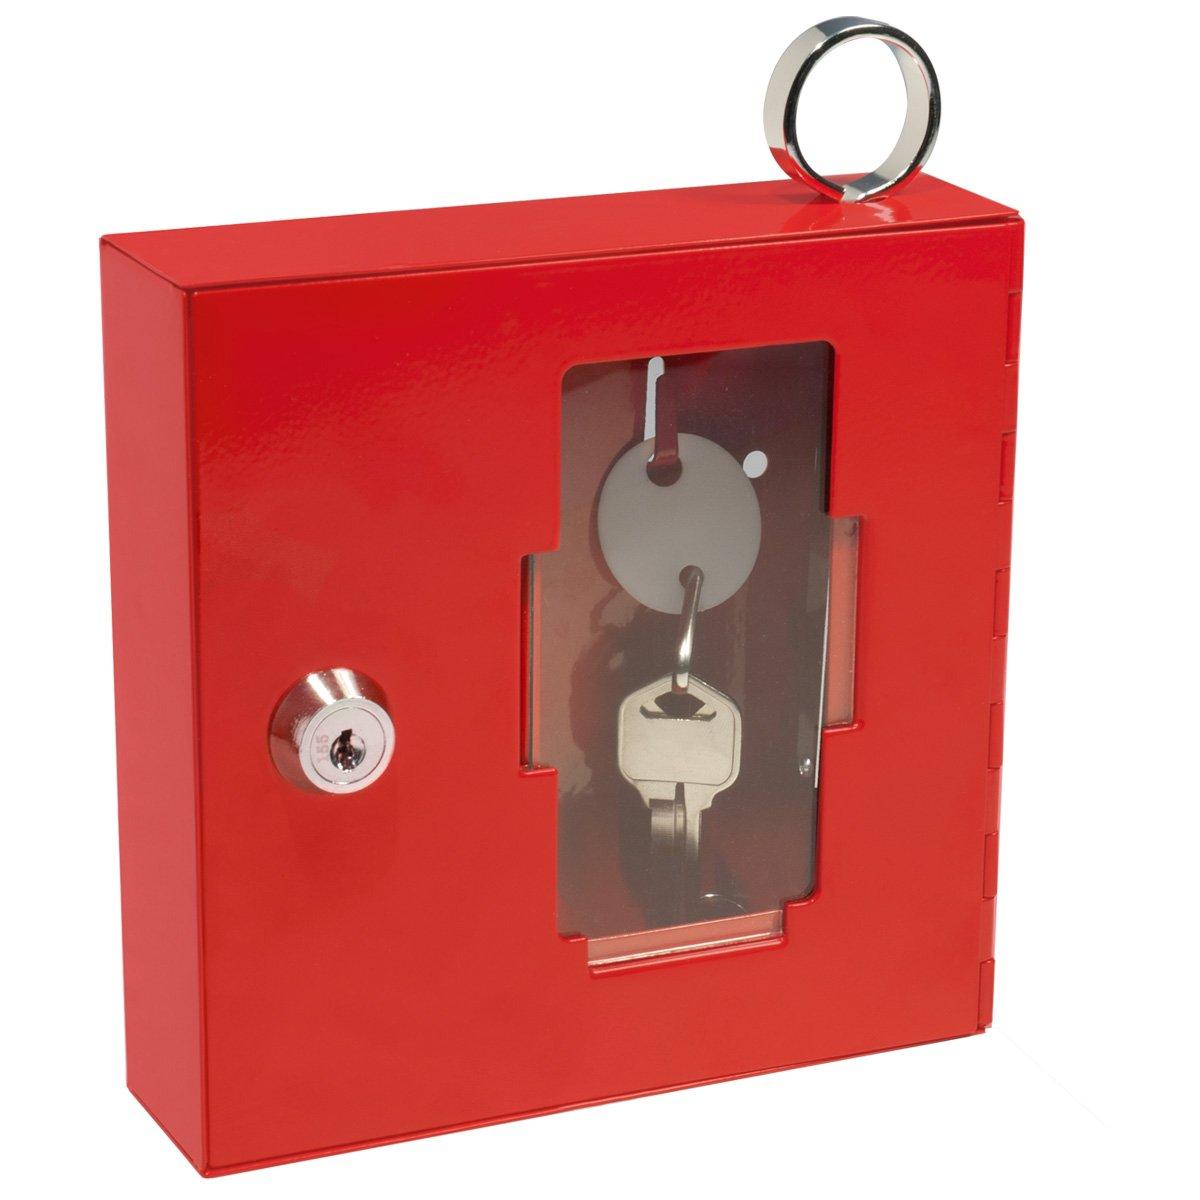 BARSKA Breakable Emergency Key Box